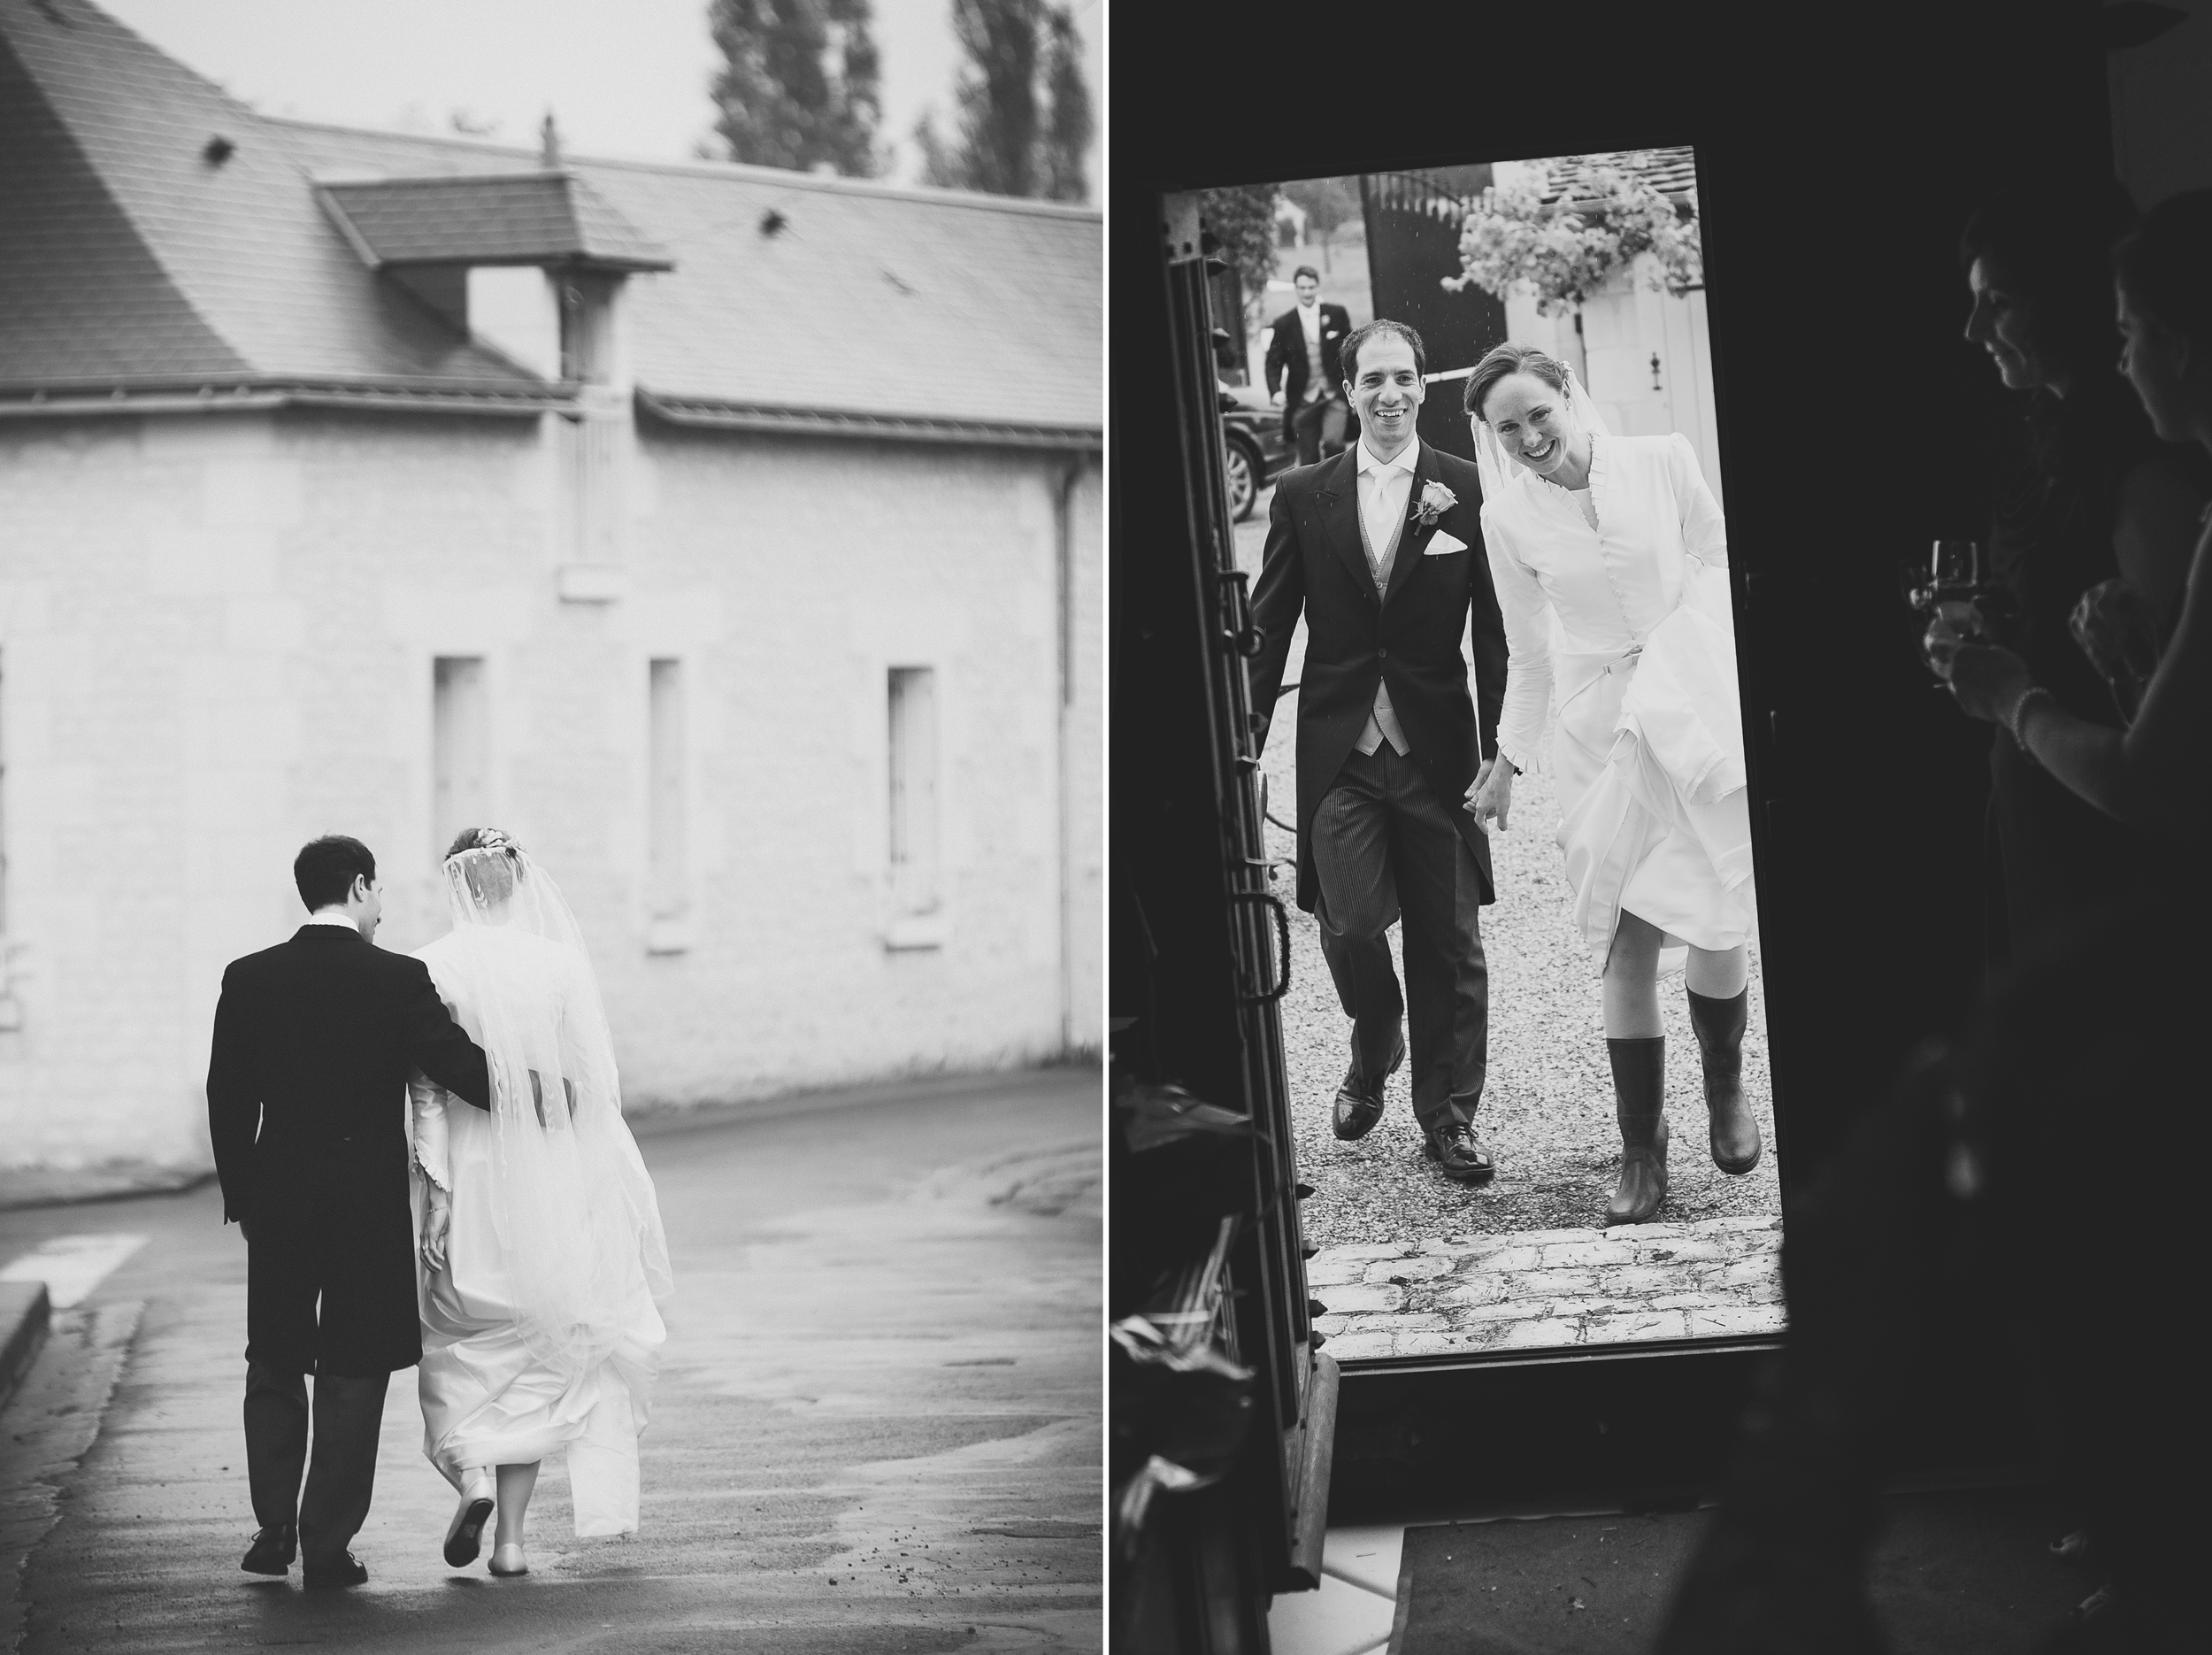 rainy-day-wedding-photos